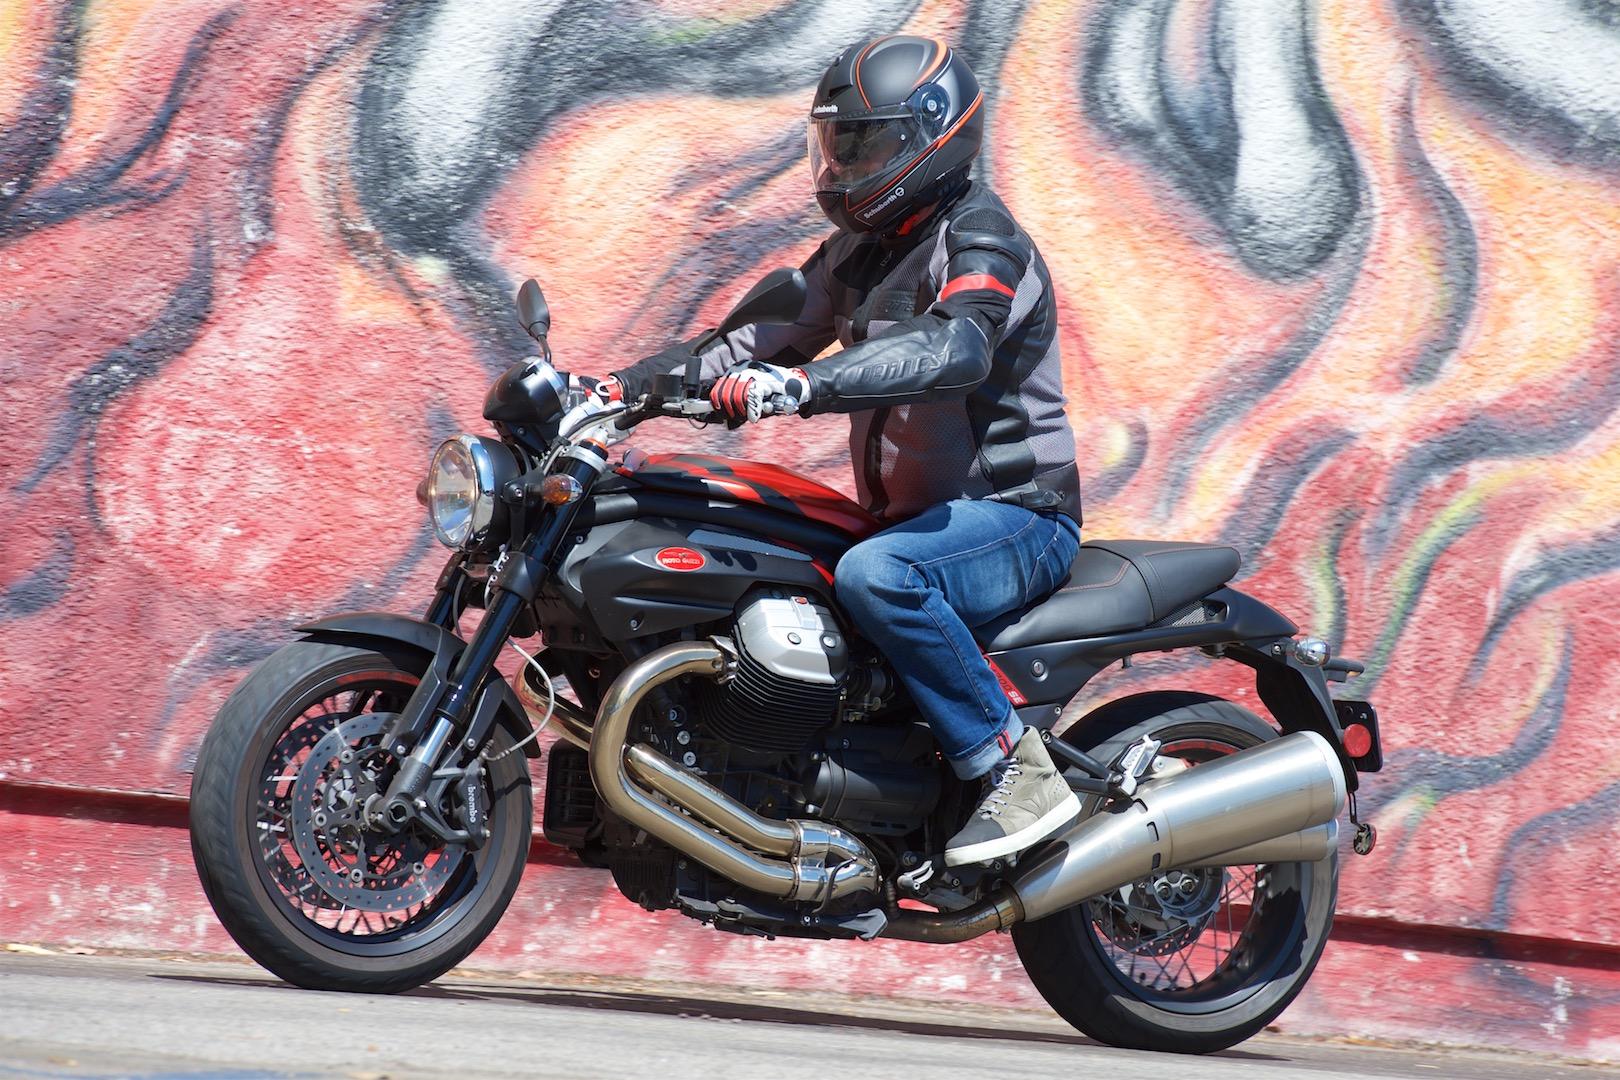 2016 moto guzzi griso 8v se review | sportbike, cruiser or urban?